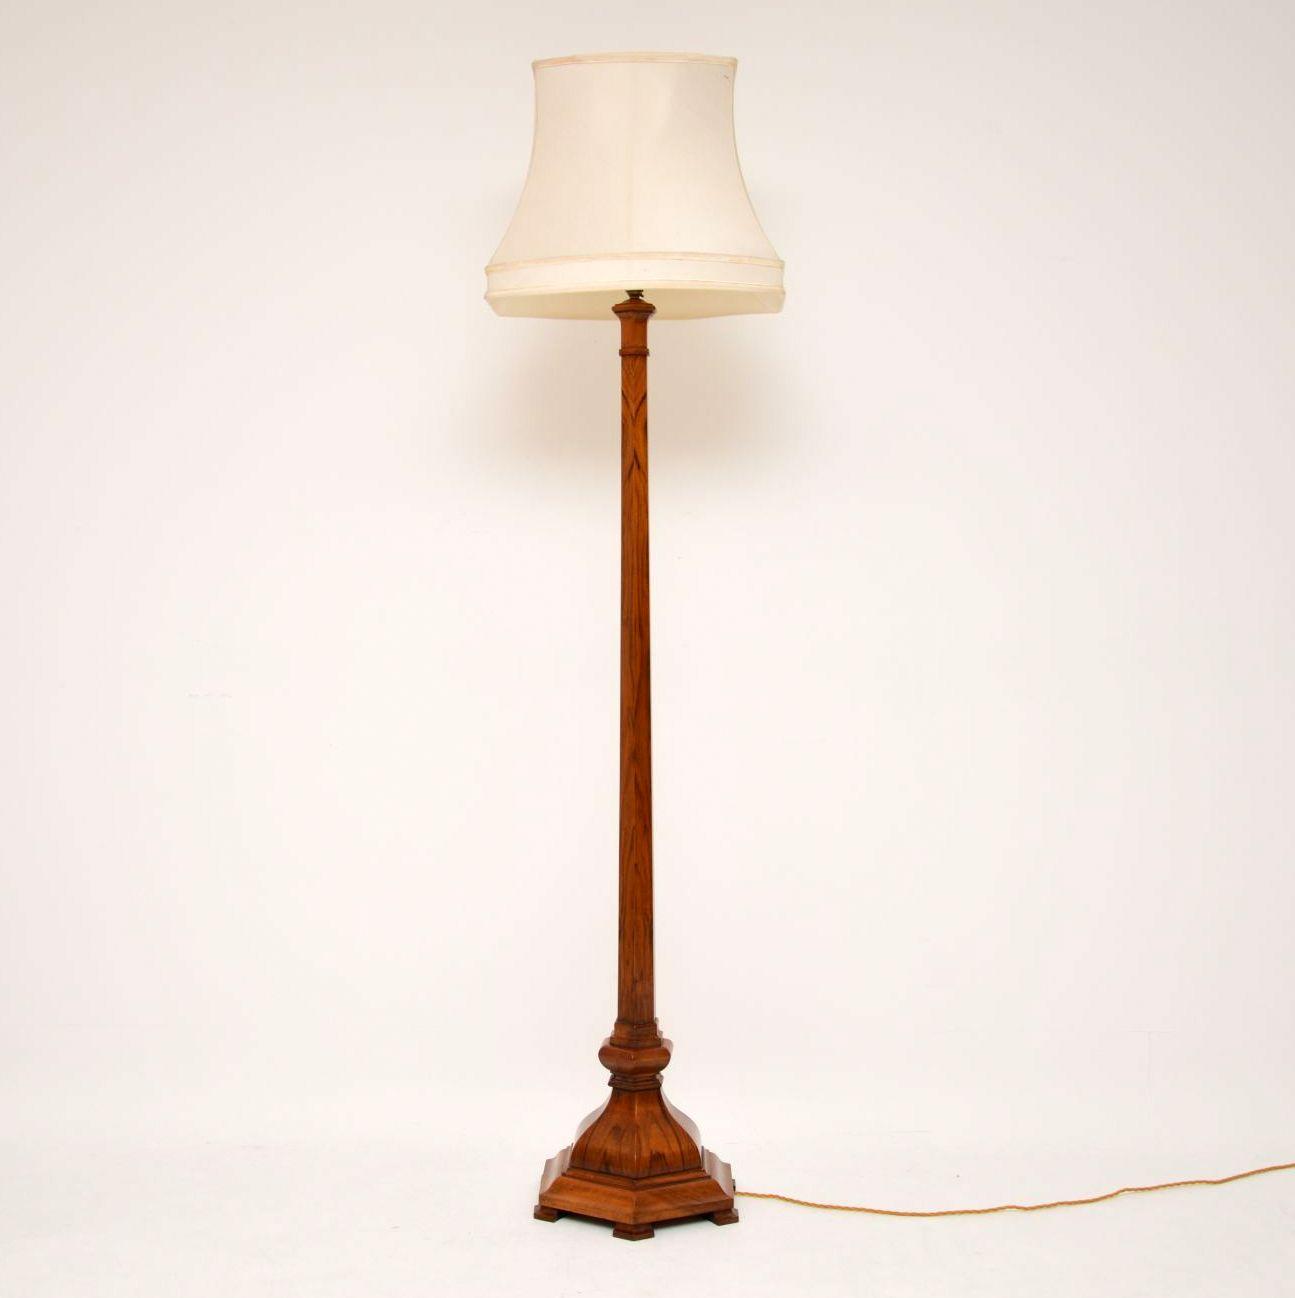 Antique Figured Walnut Lamp Stand